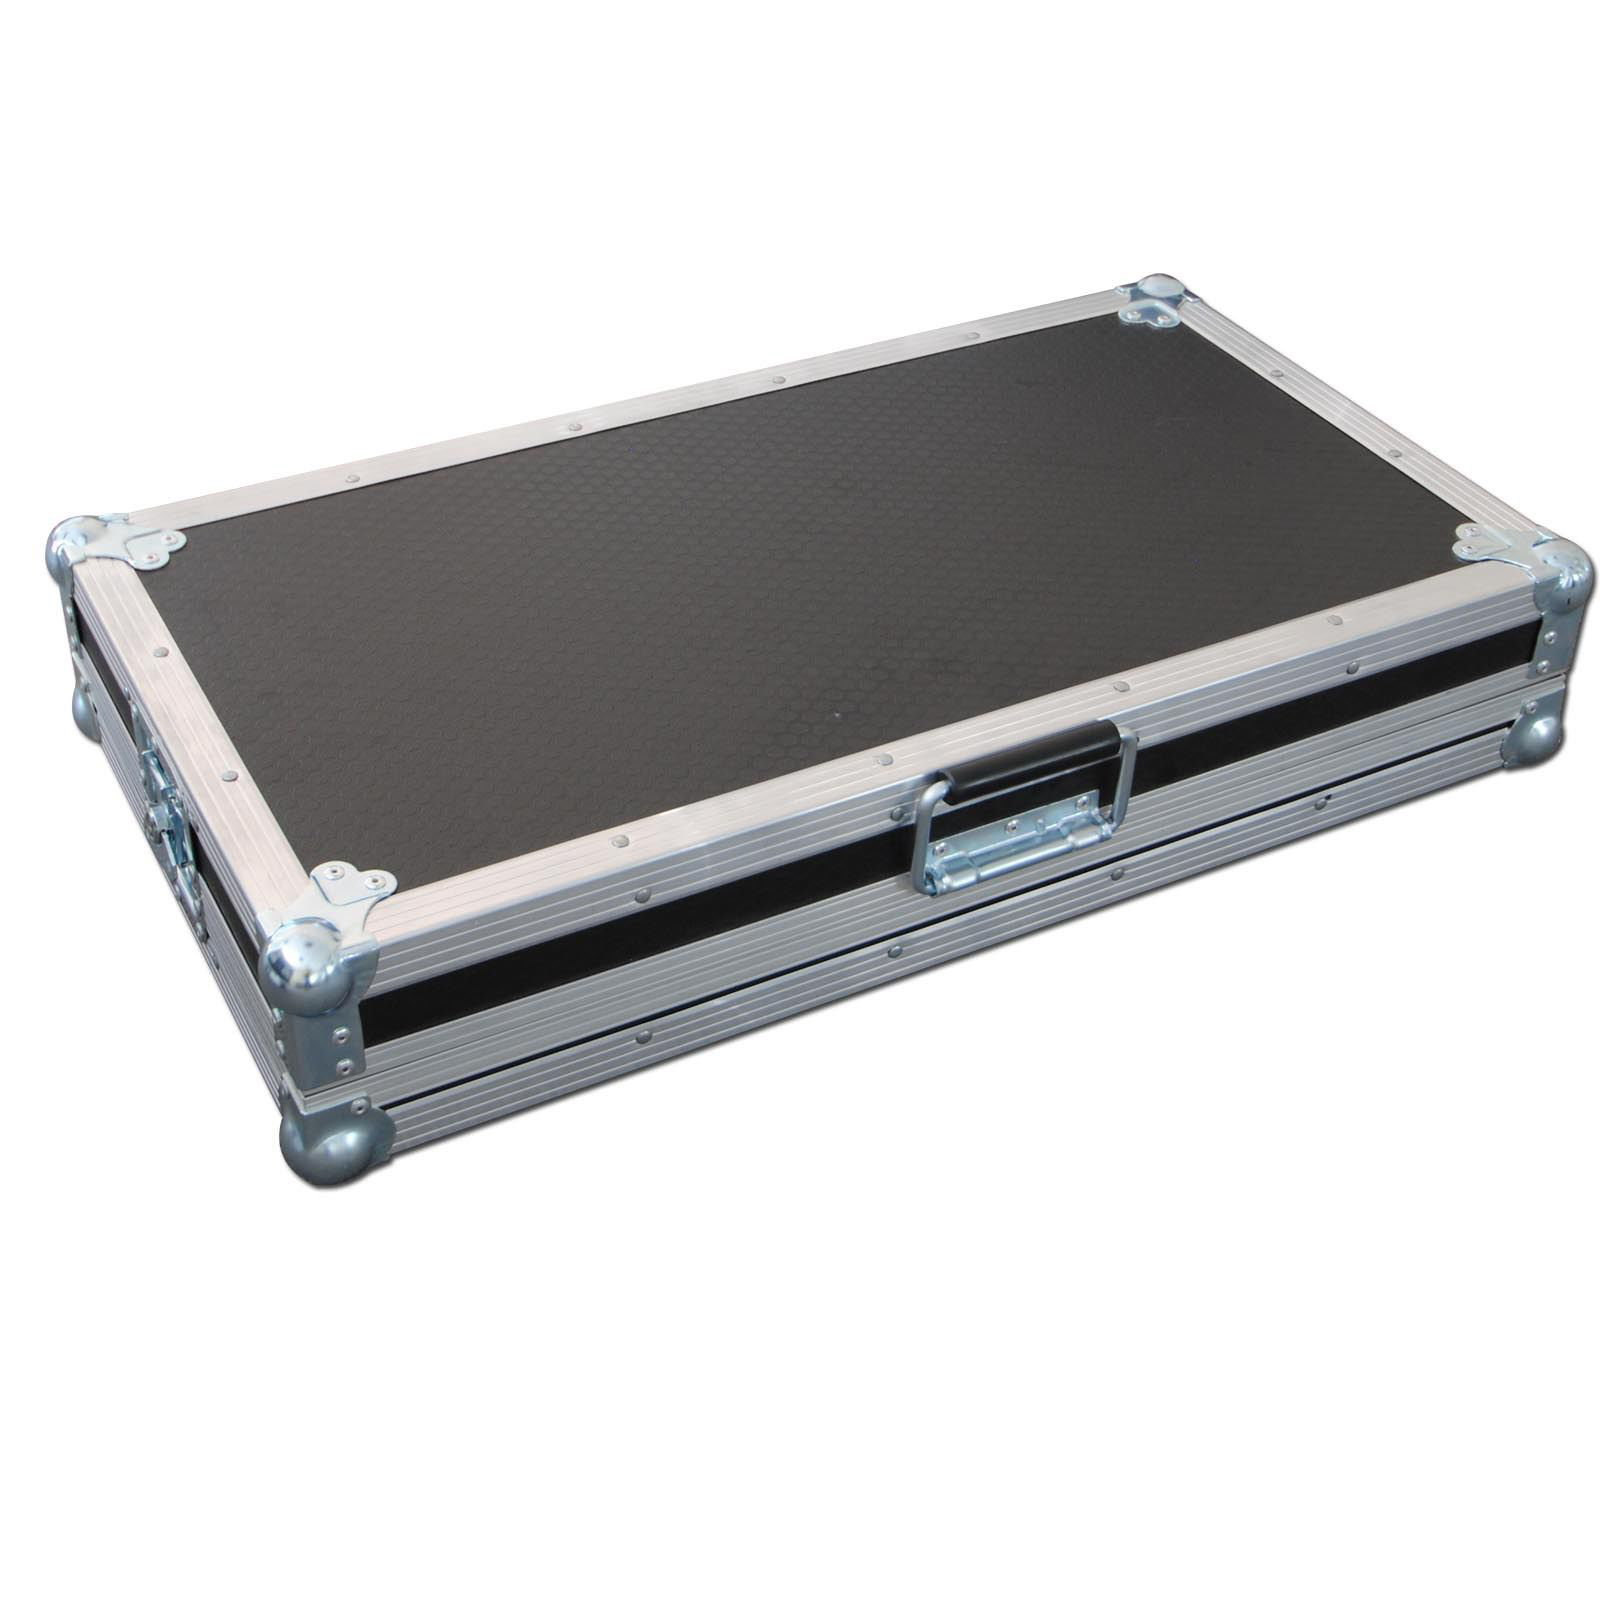 flightcase warehouse guitar effects pedal board flight case medium. Black Bedroom Furniture Sets. Home Design Ideas